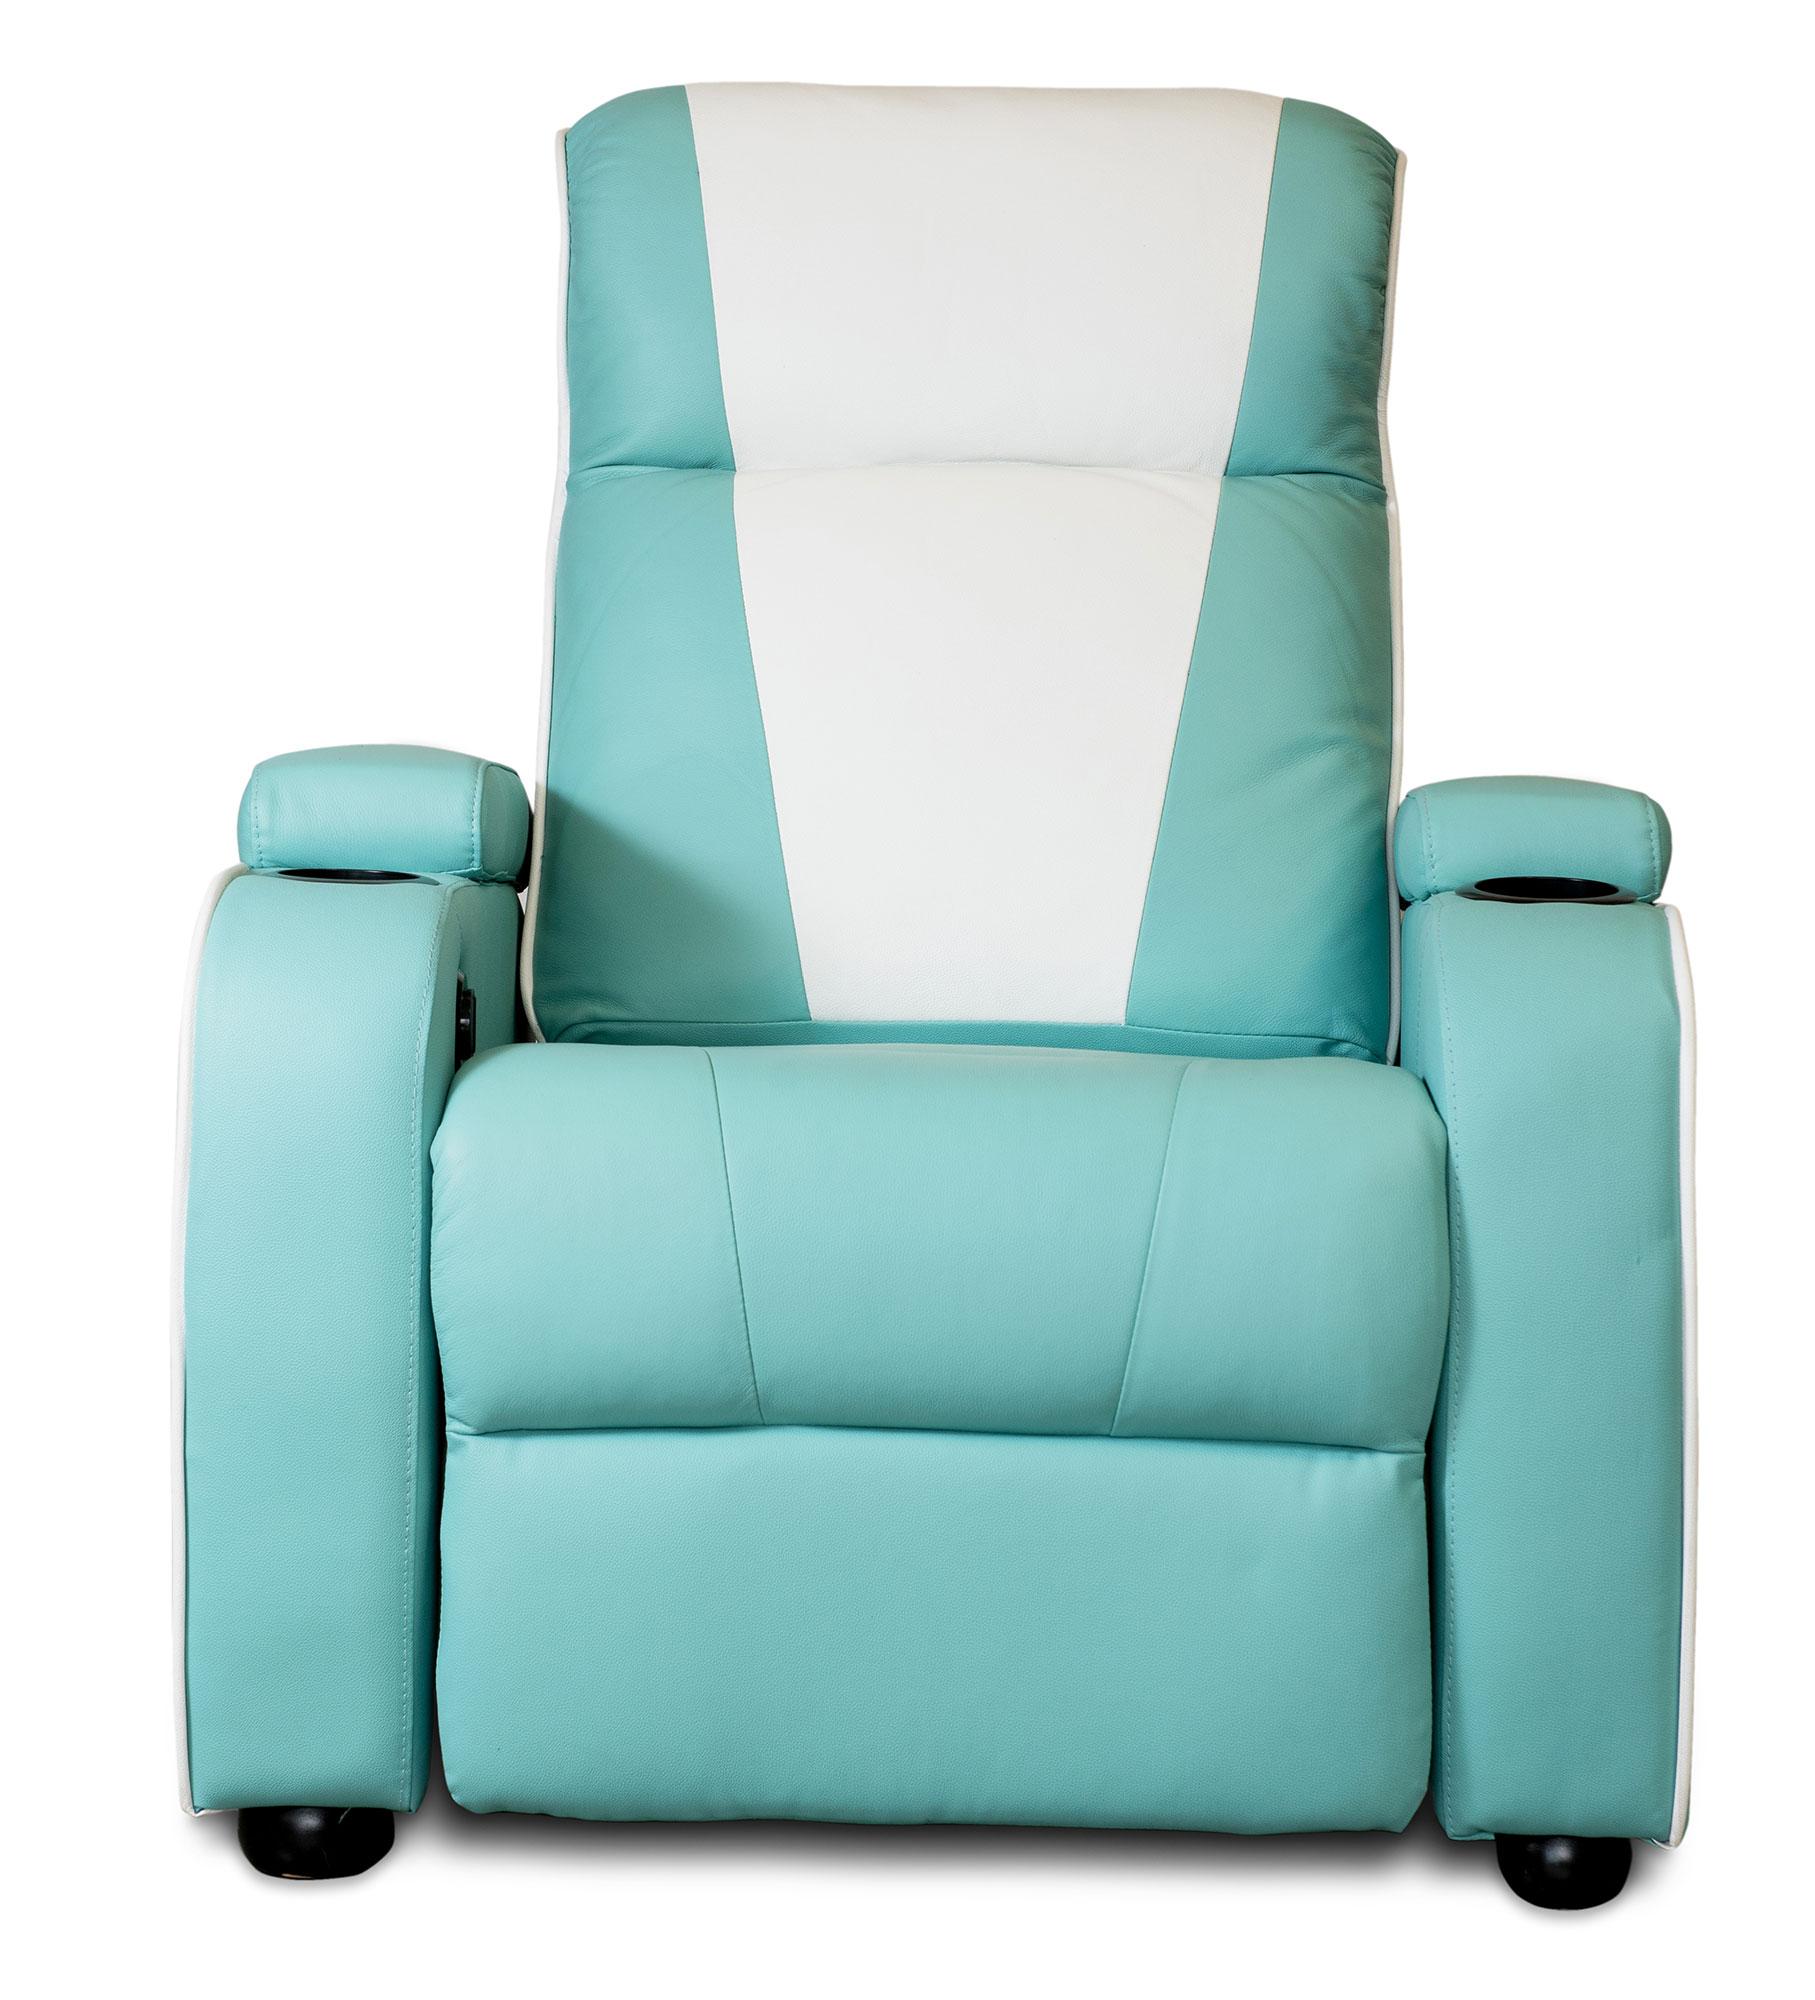 heimkino sessel, route 66 store - metro heimkino sessel single turquoise, Design ideen